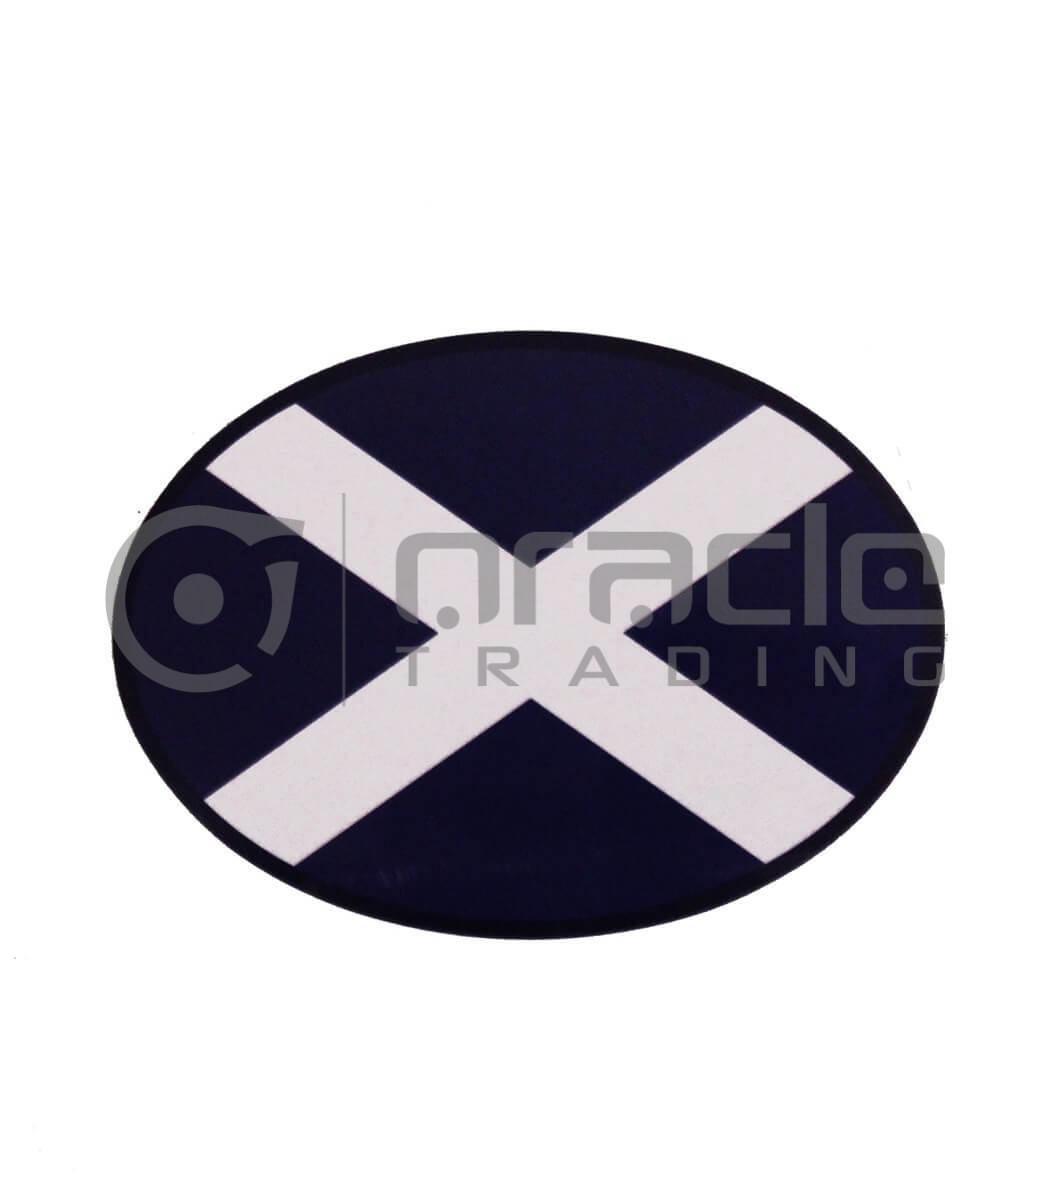 Scotland Oval Decal - Plain